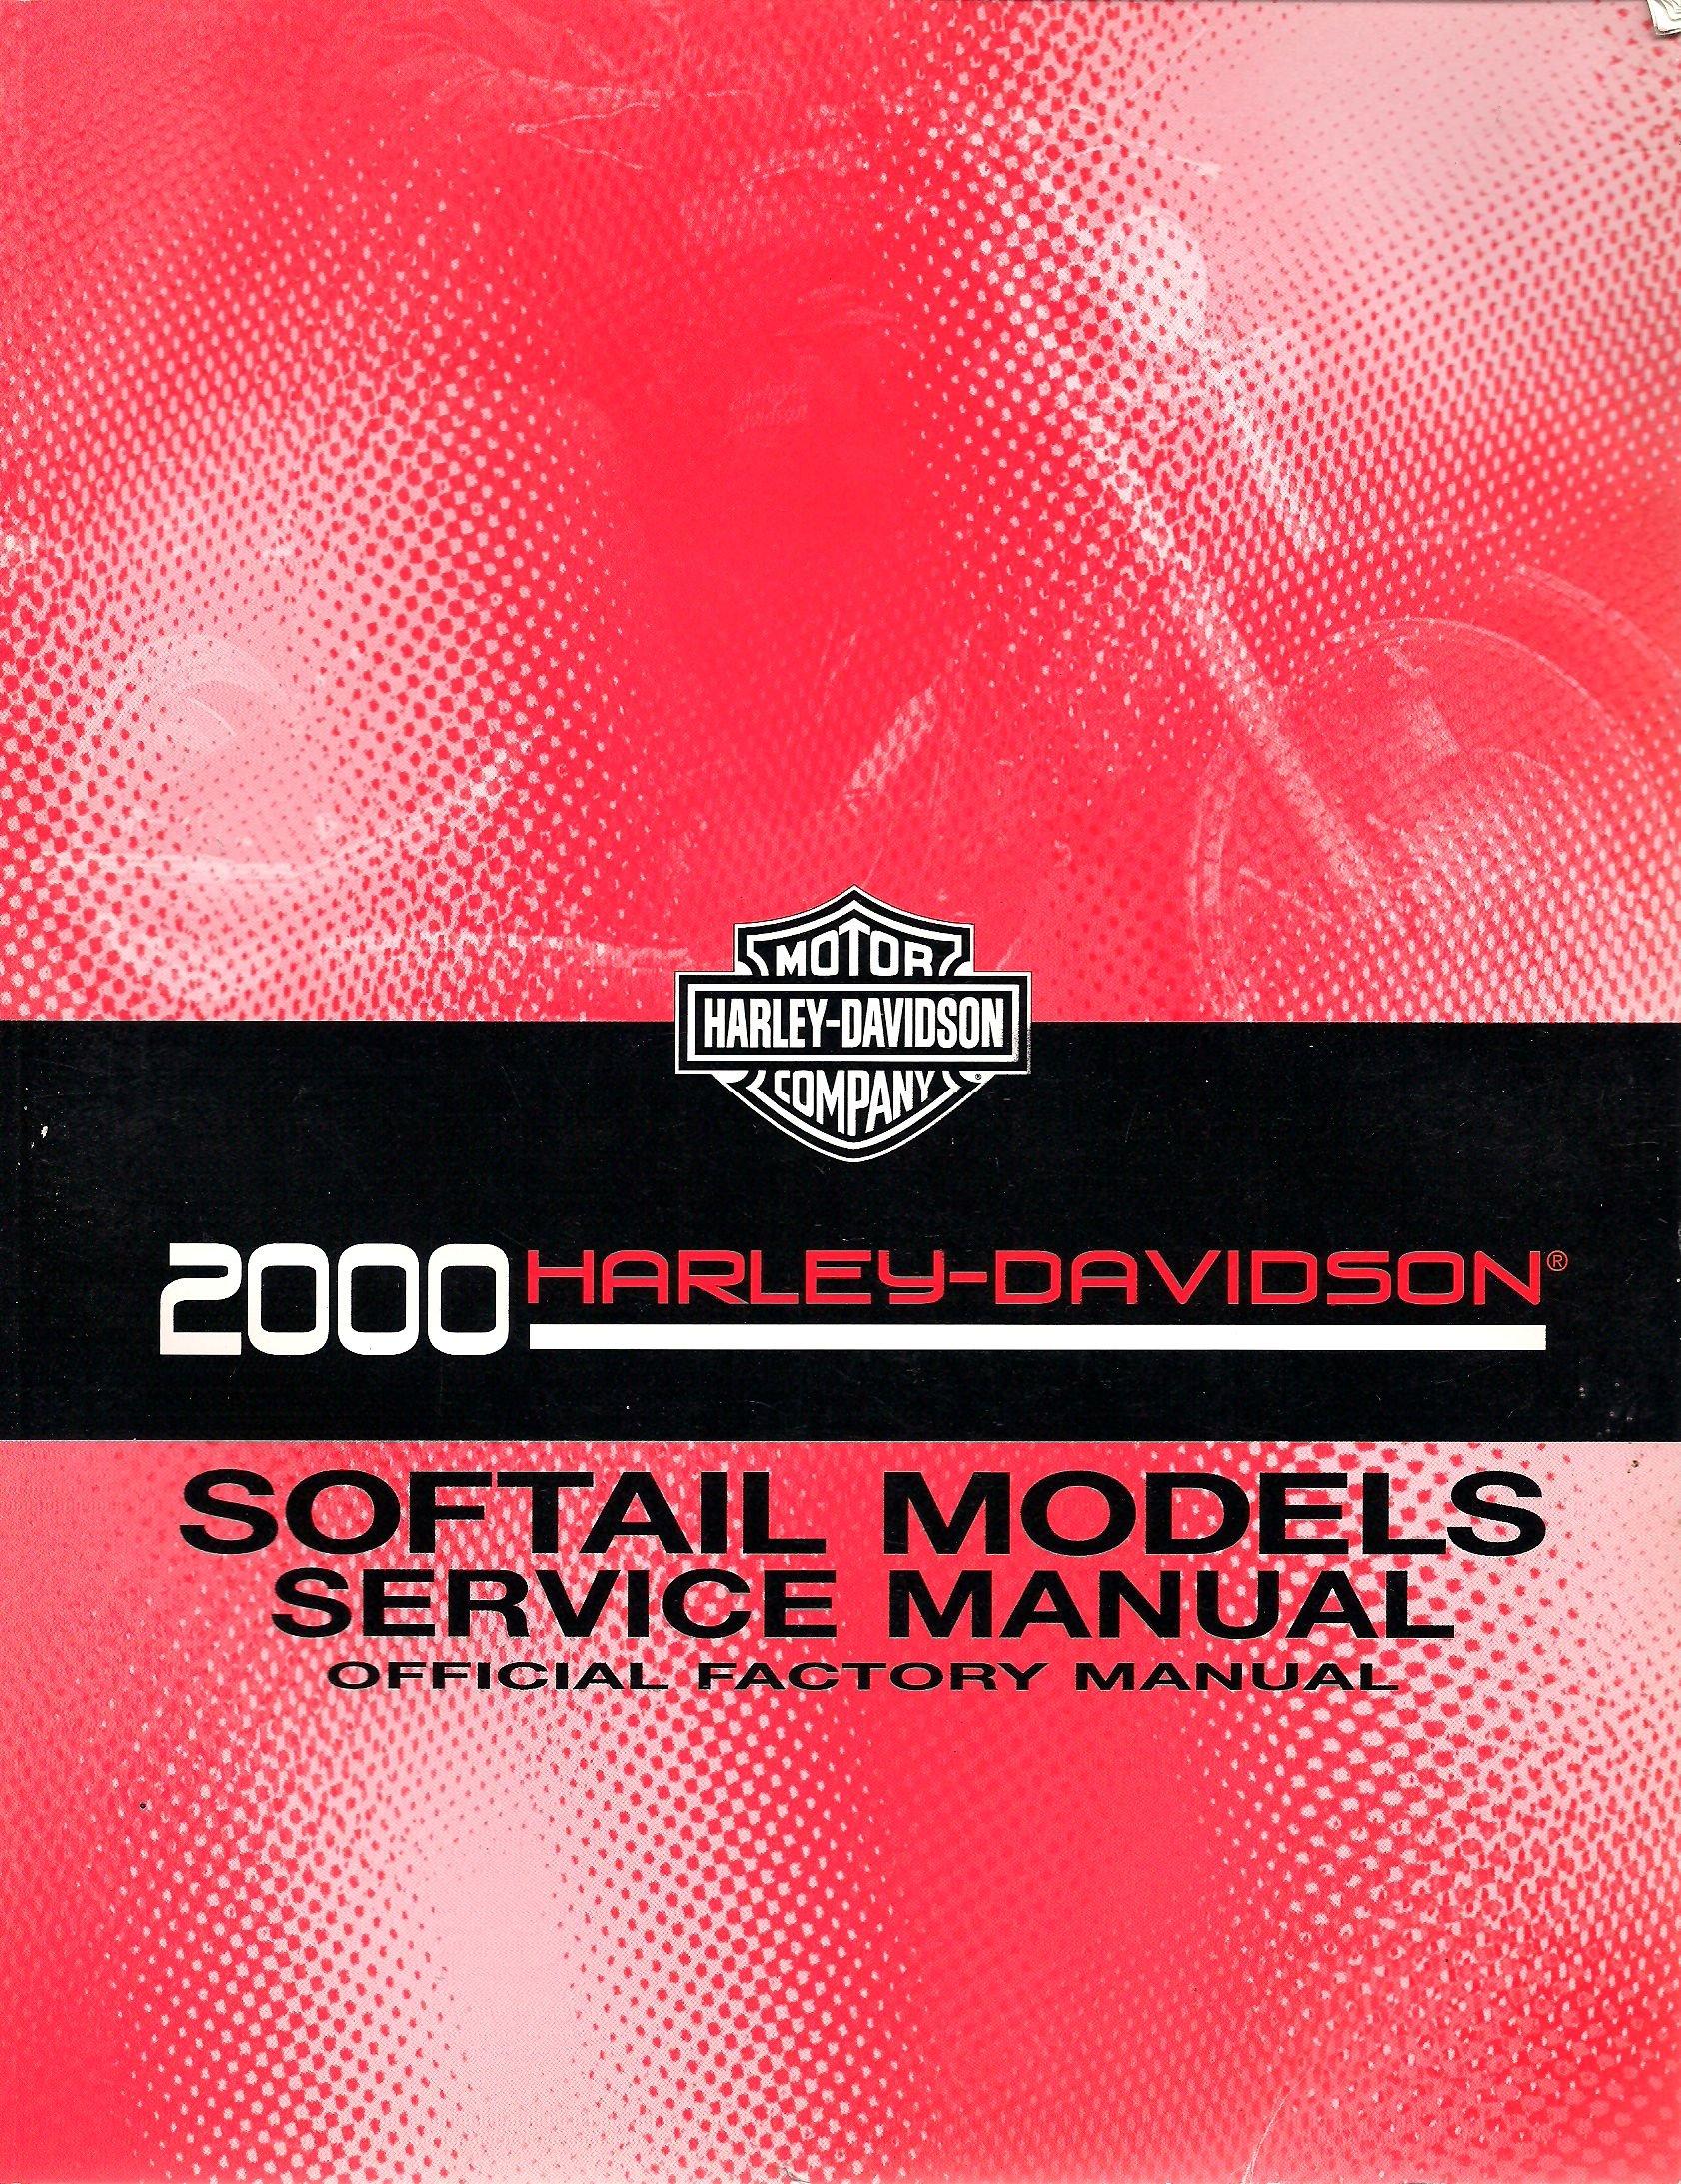 2000 Harley-Davidson Softail Models Service Manual, Official Factory Manual,  PN: 99482-00A: Harley-Davidson: Amazon.com: Books